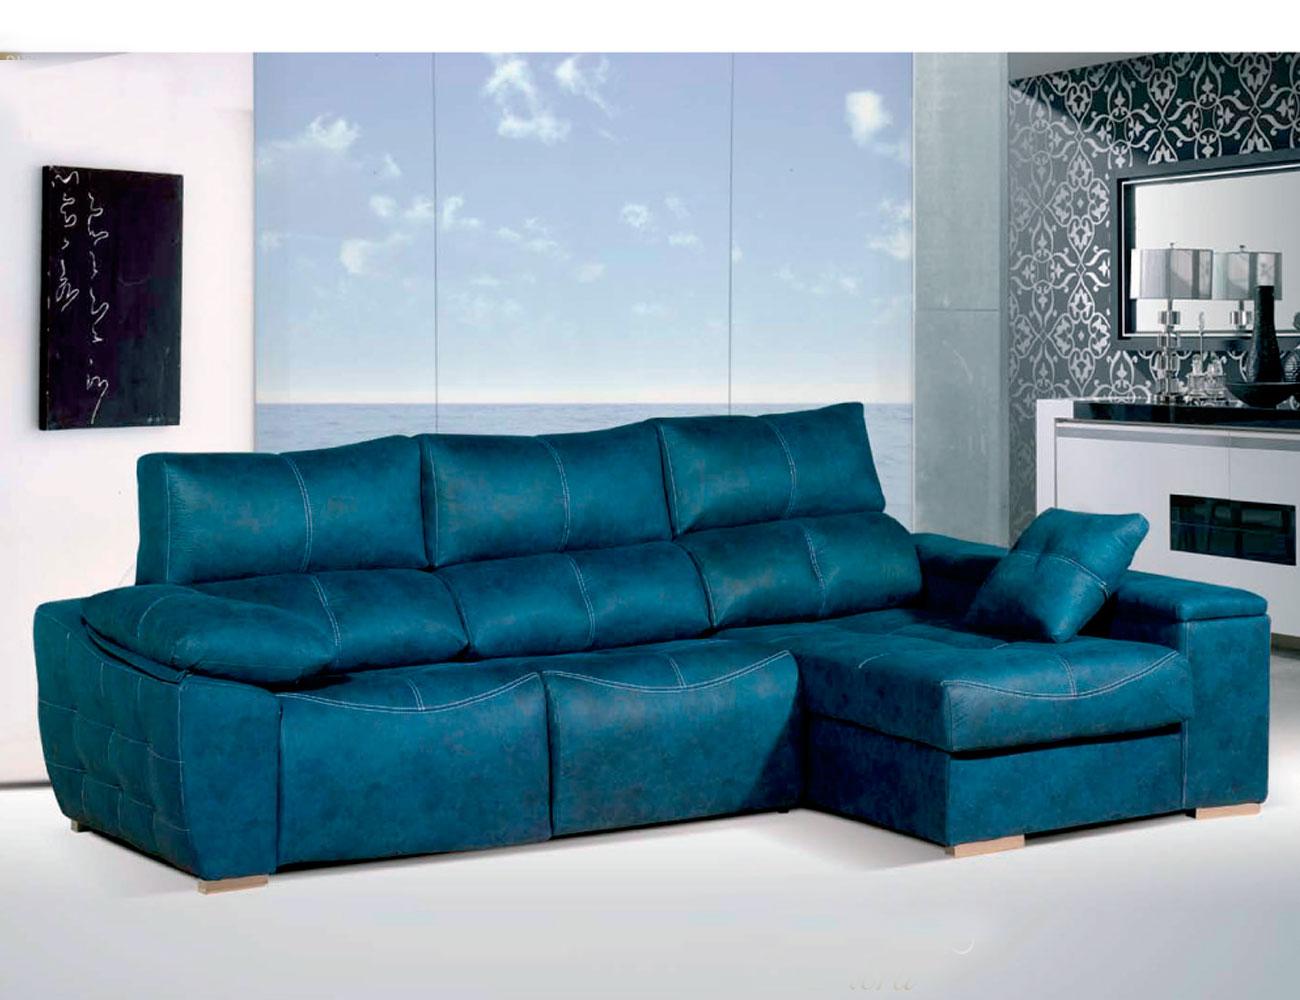 Sofa chaiselongue relax 2 motores anti manchas turquesa4